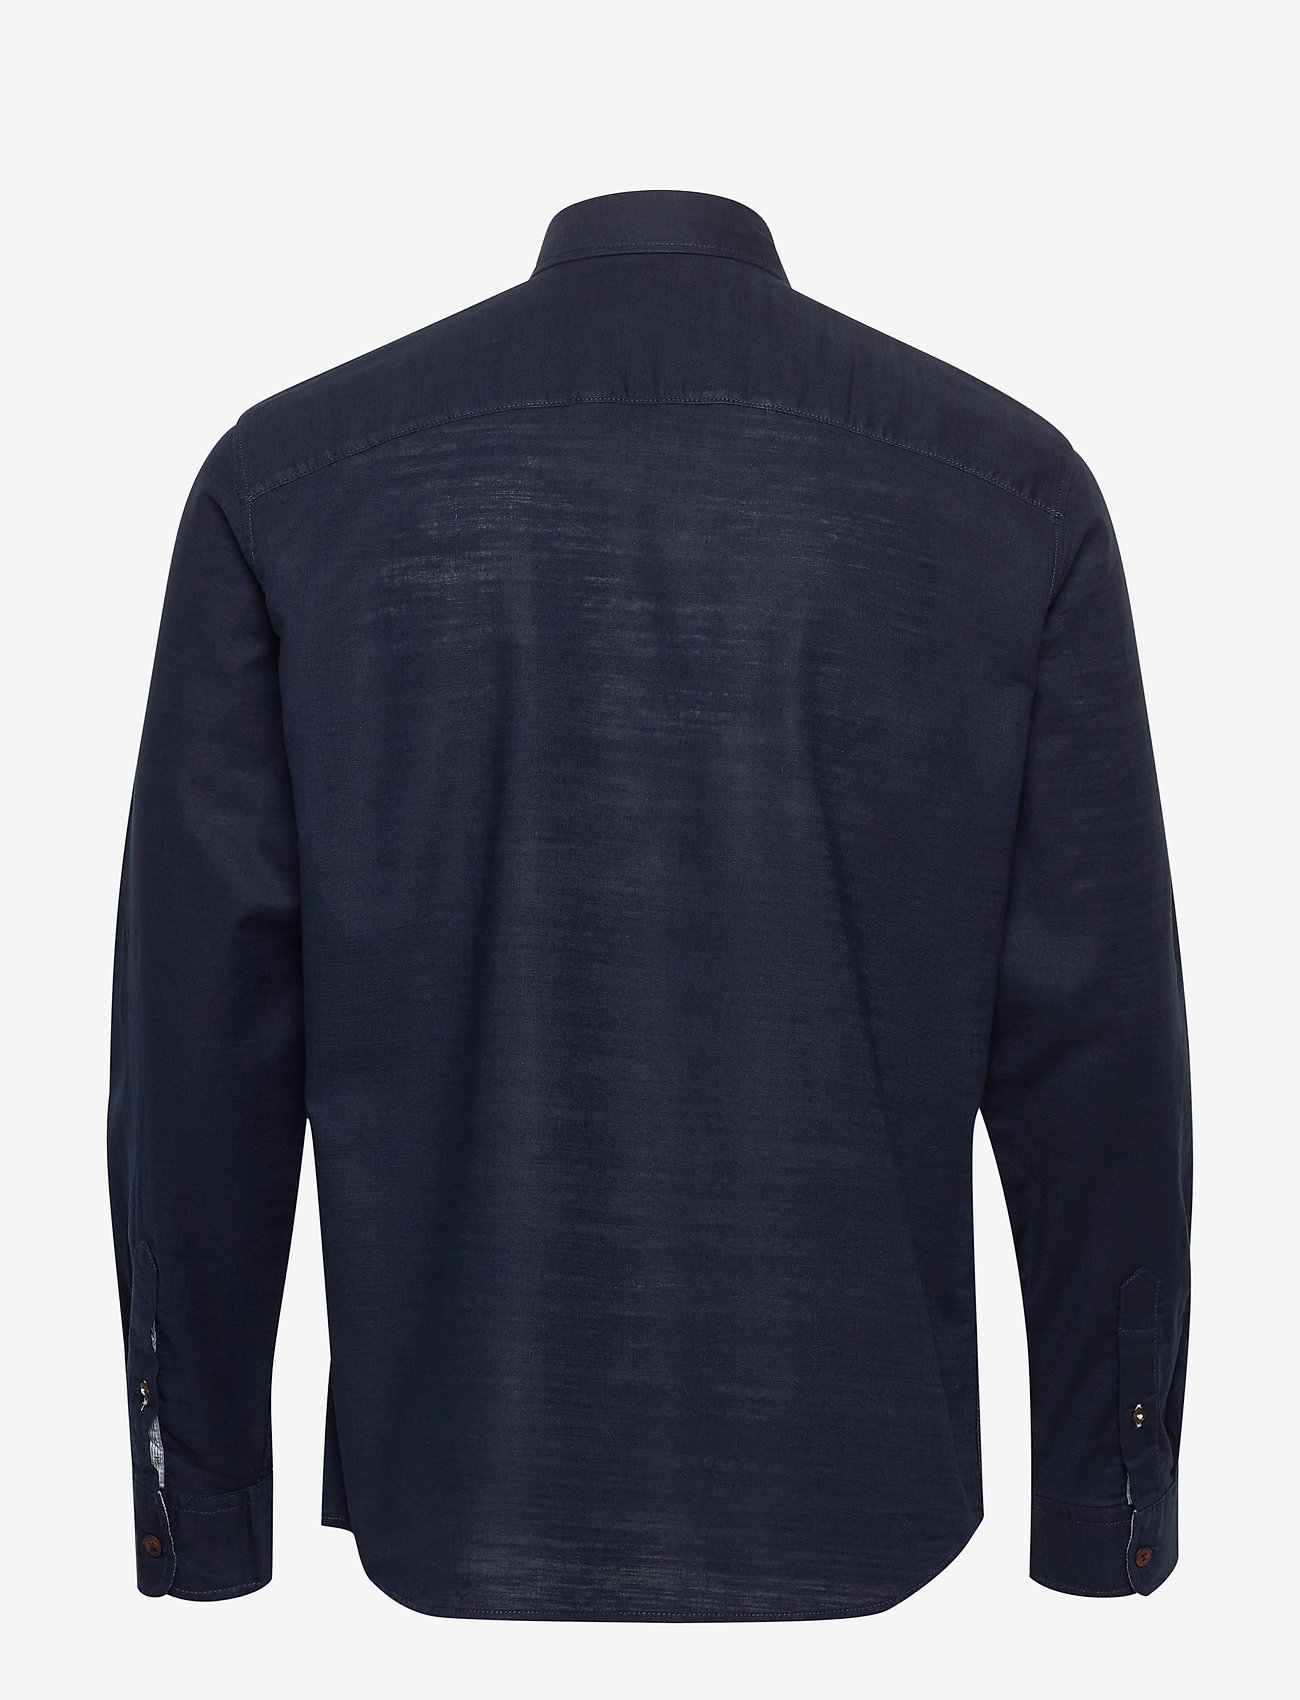 Jack & Jones - JORCHANDLER SHIRT LS - basic skjortor - navy blazer - 1